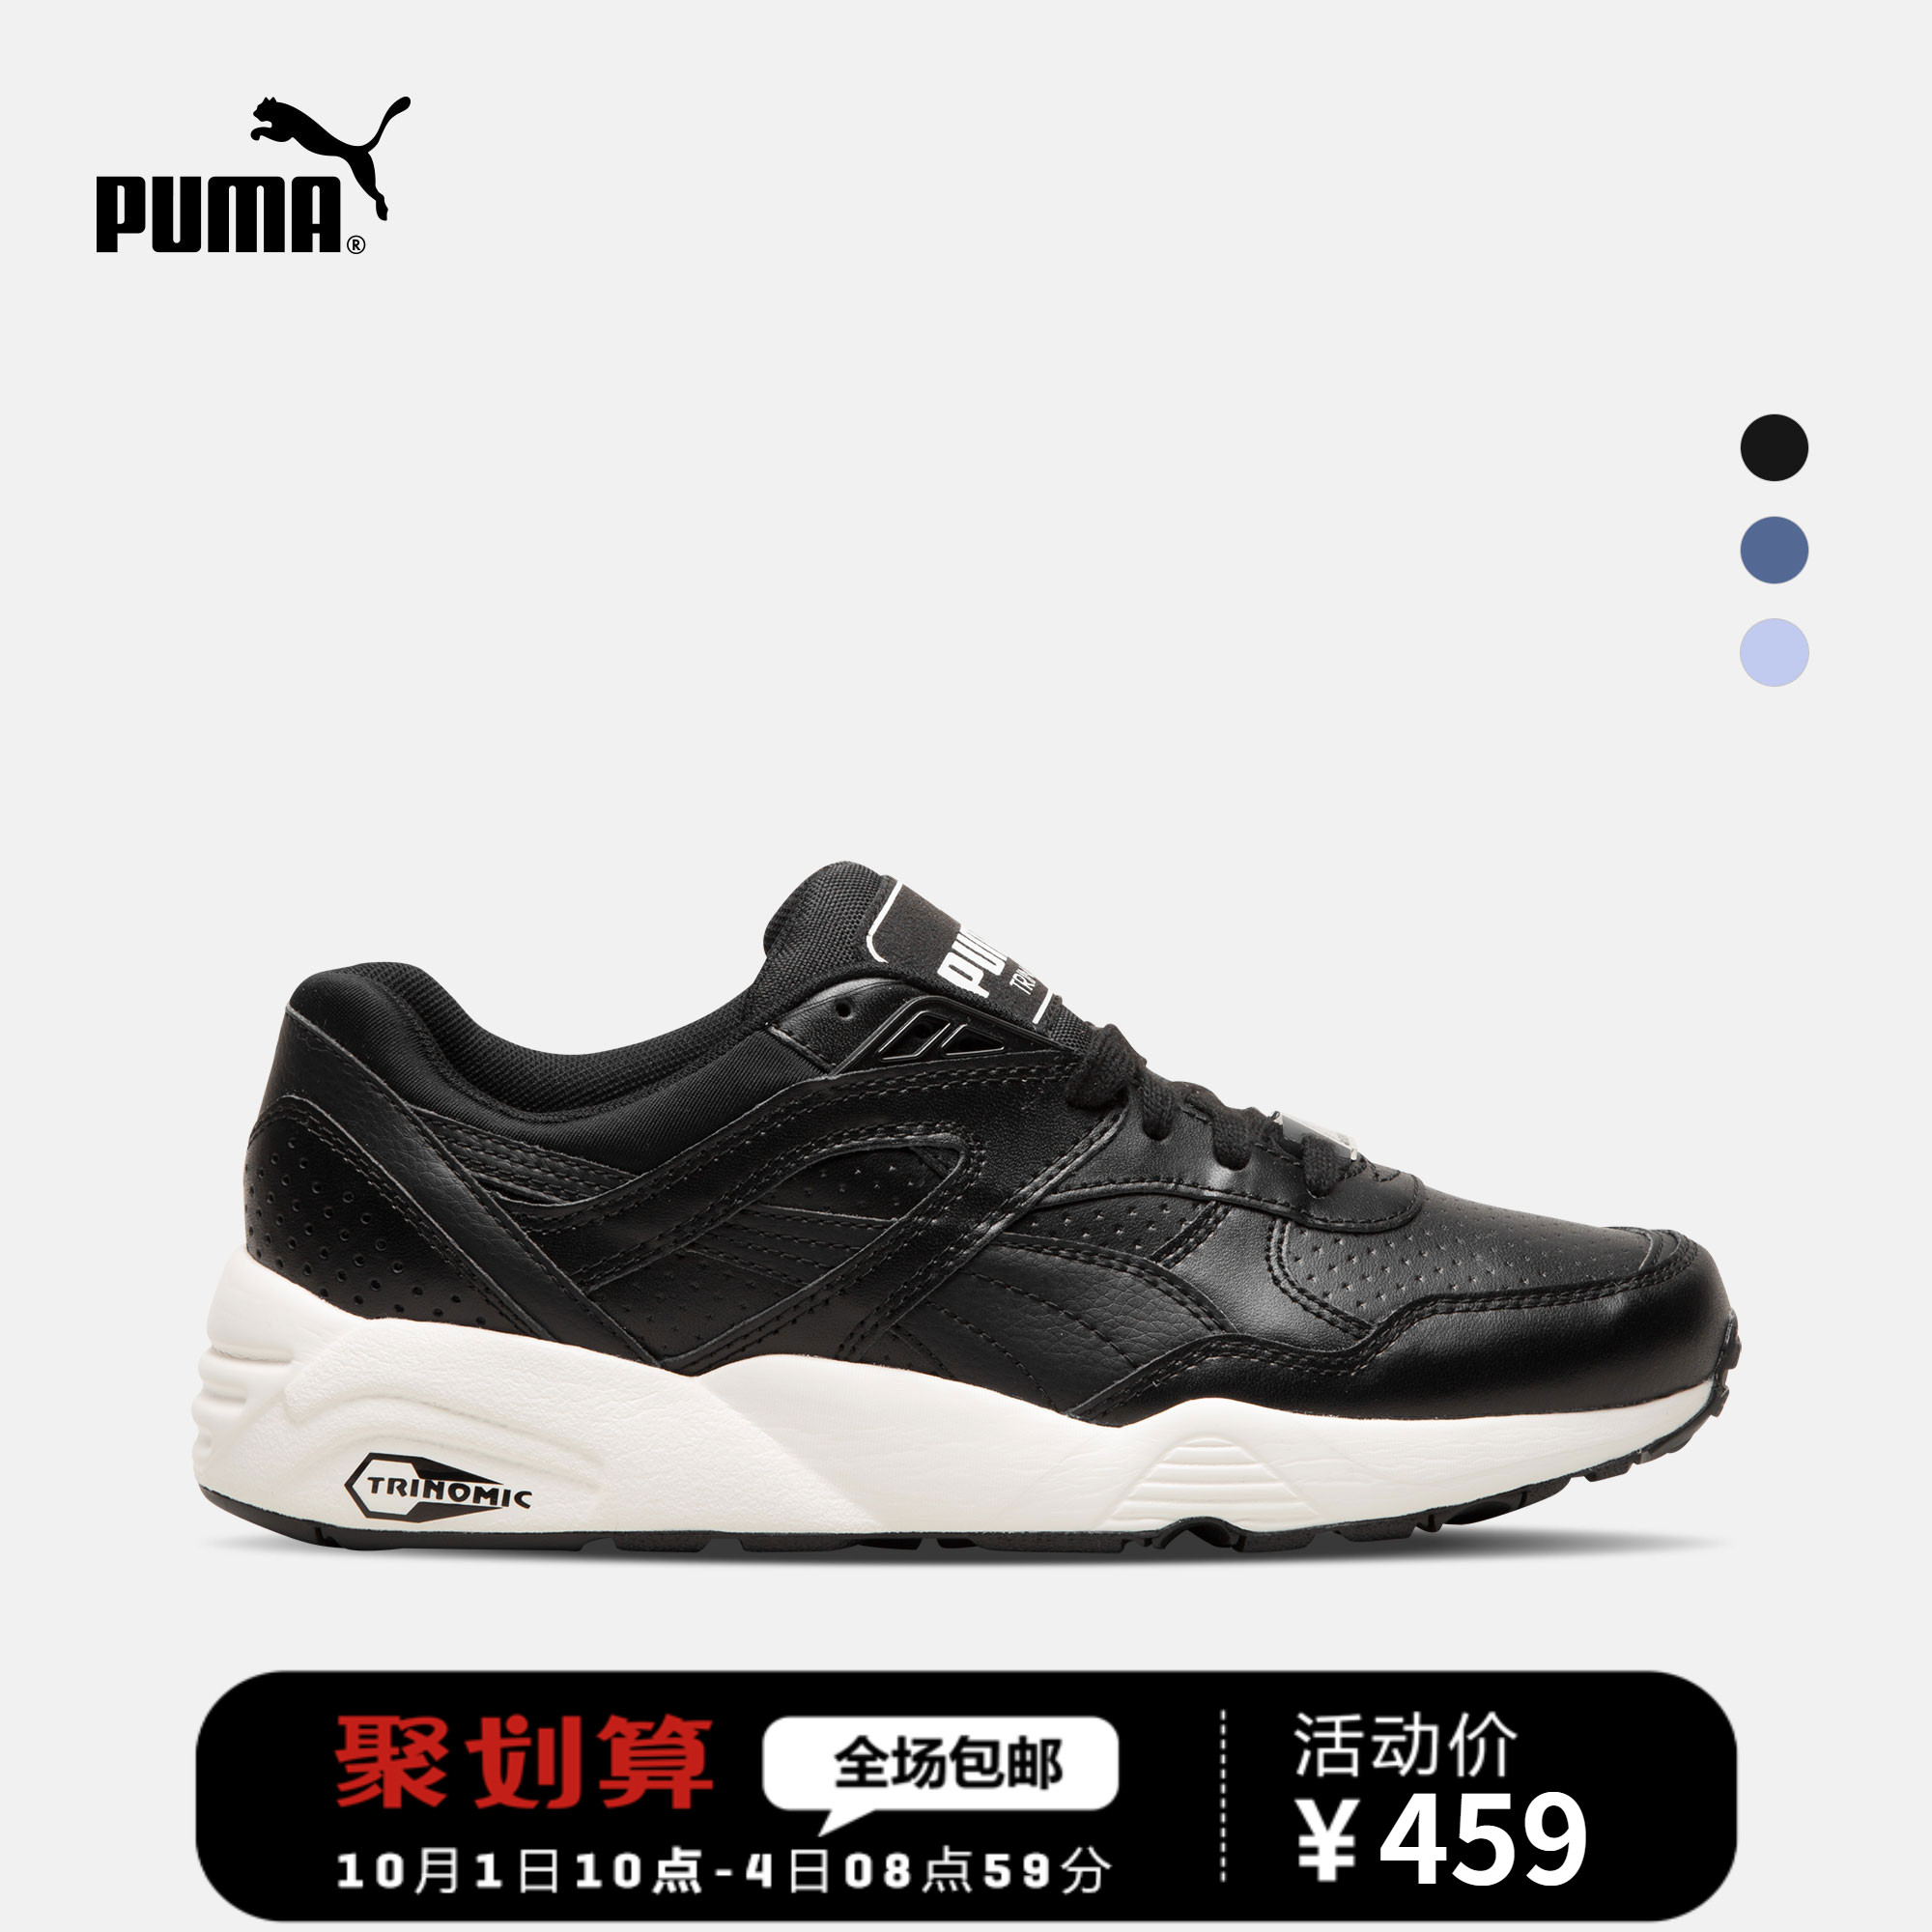 PUMA彪马官方 男女同款休闲鞋 R698 Perf 363753